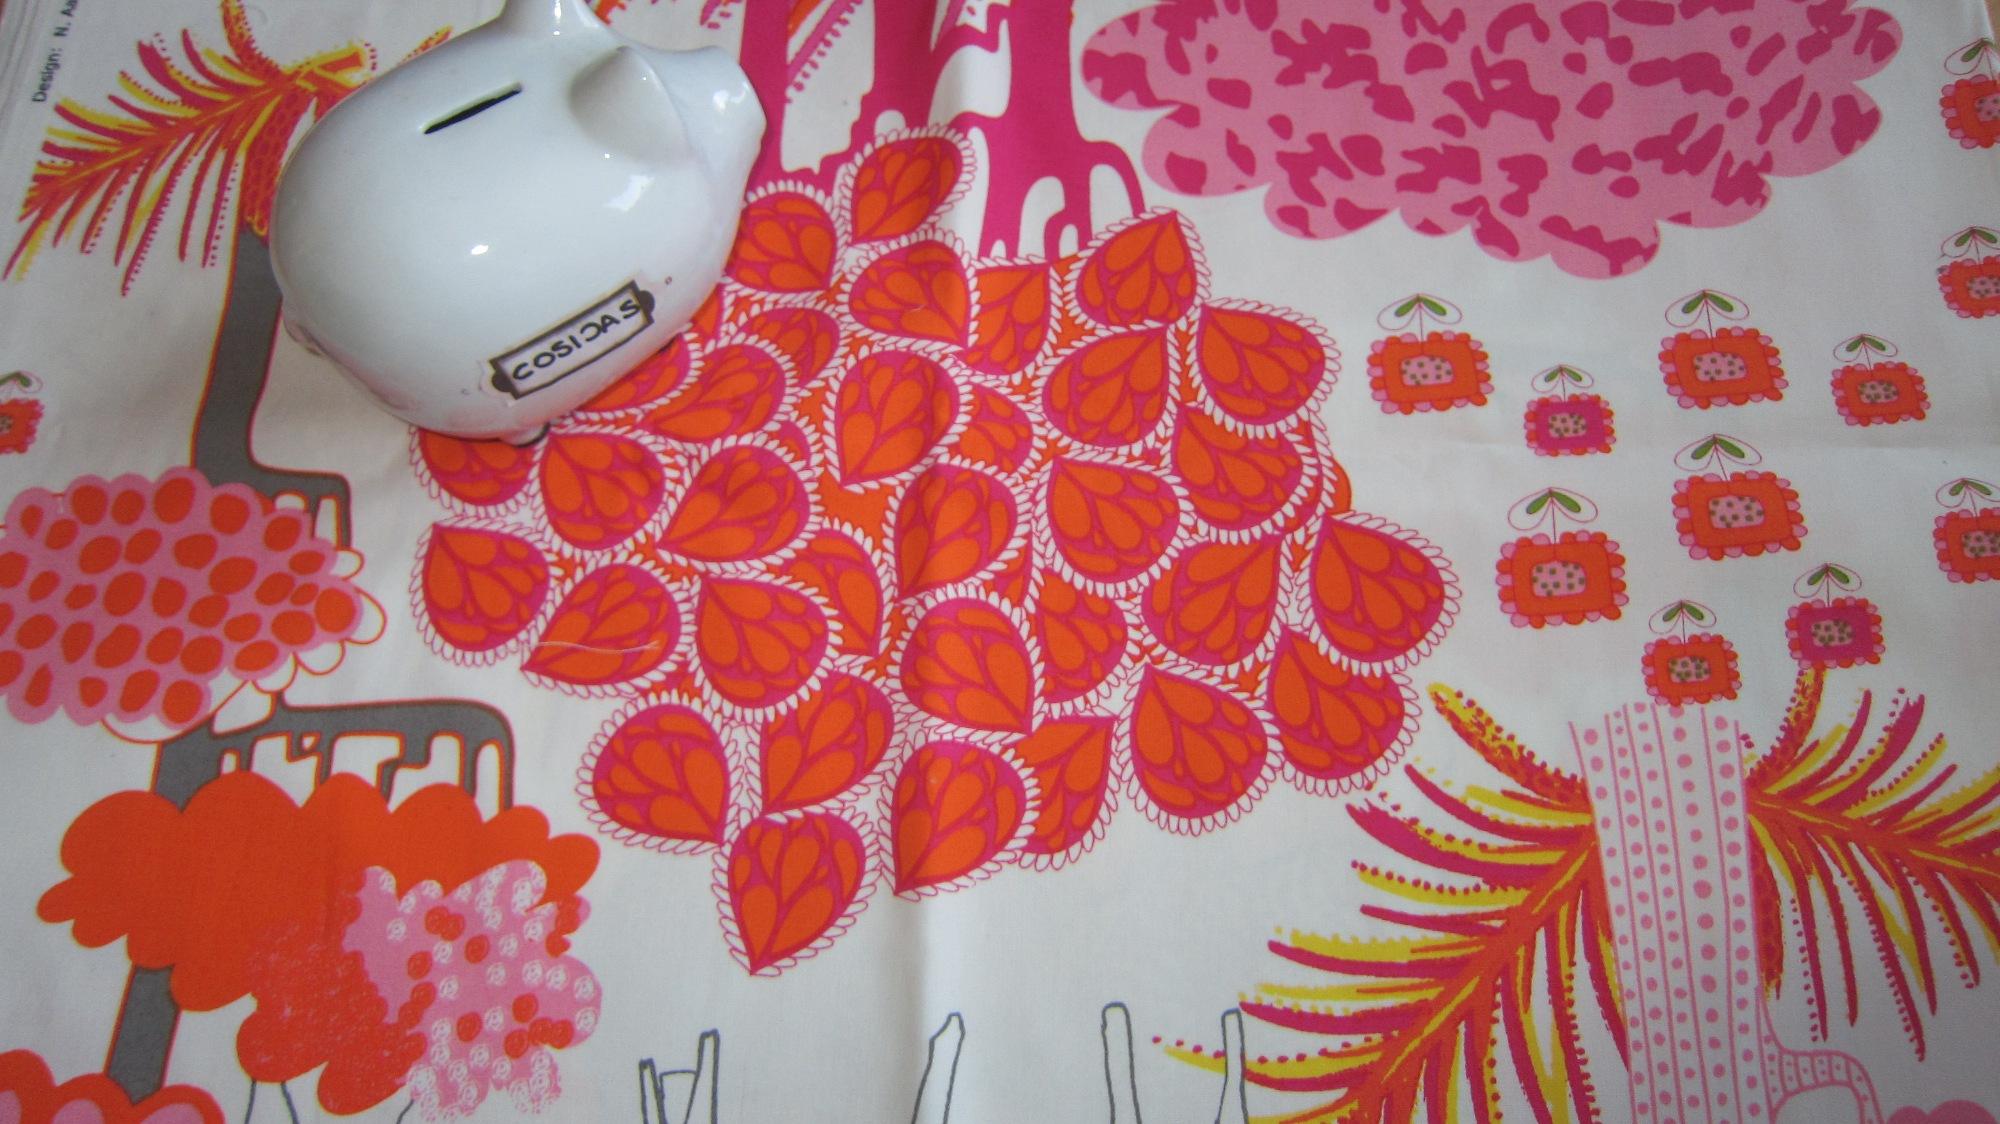 Árboles naranja